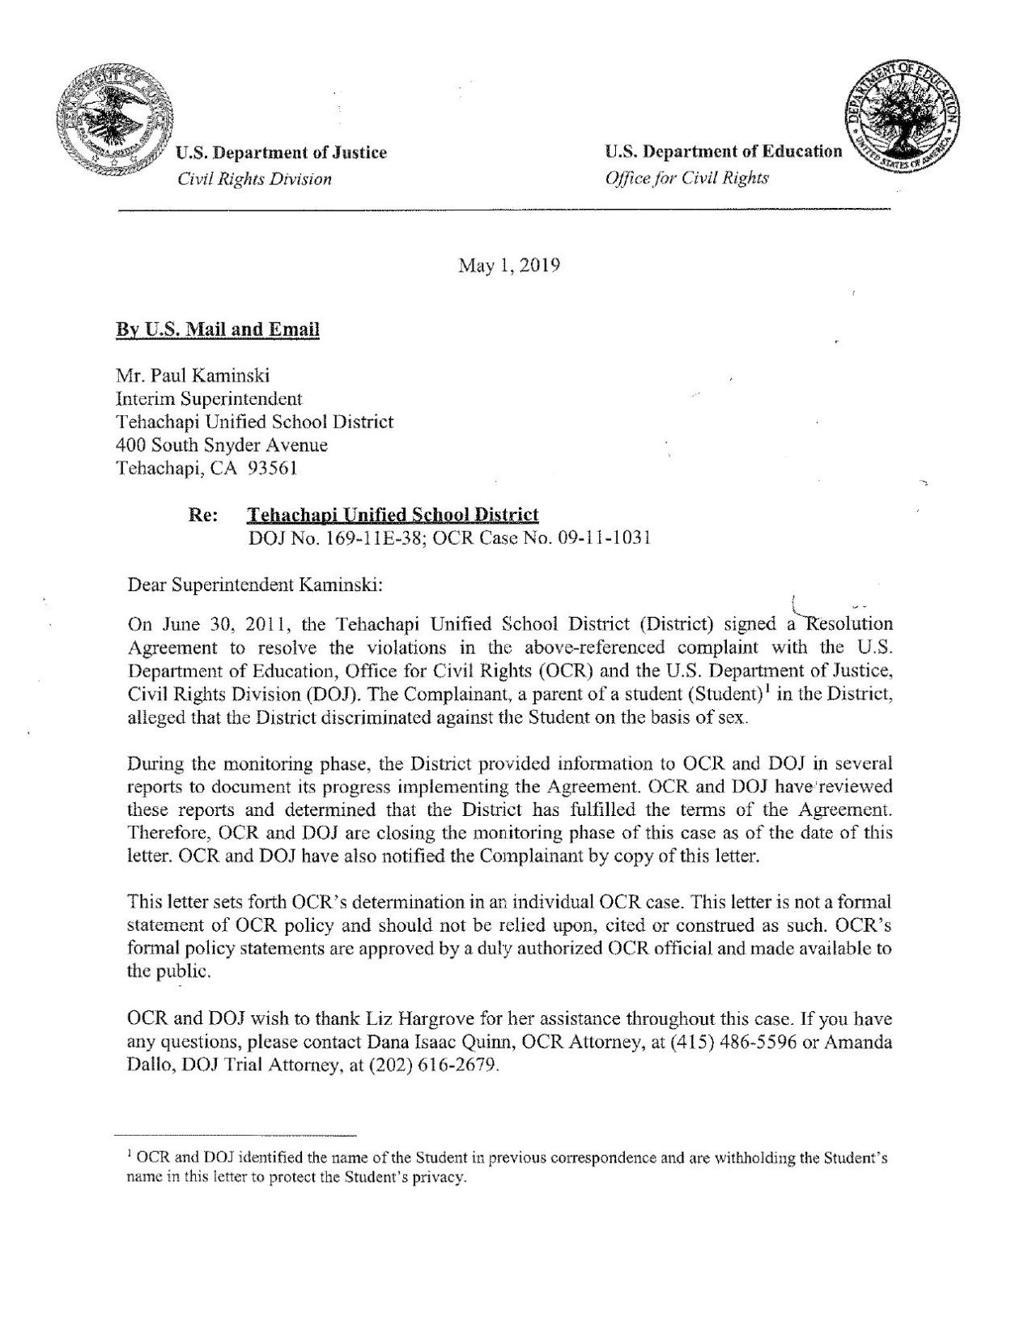 Federal agencies lift monitoring of Tehachapi Unified